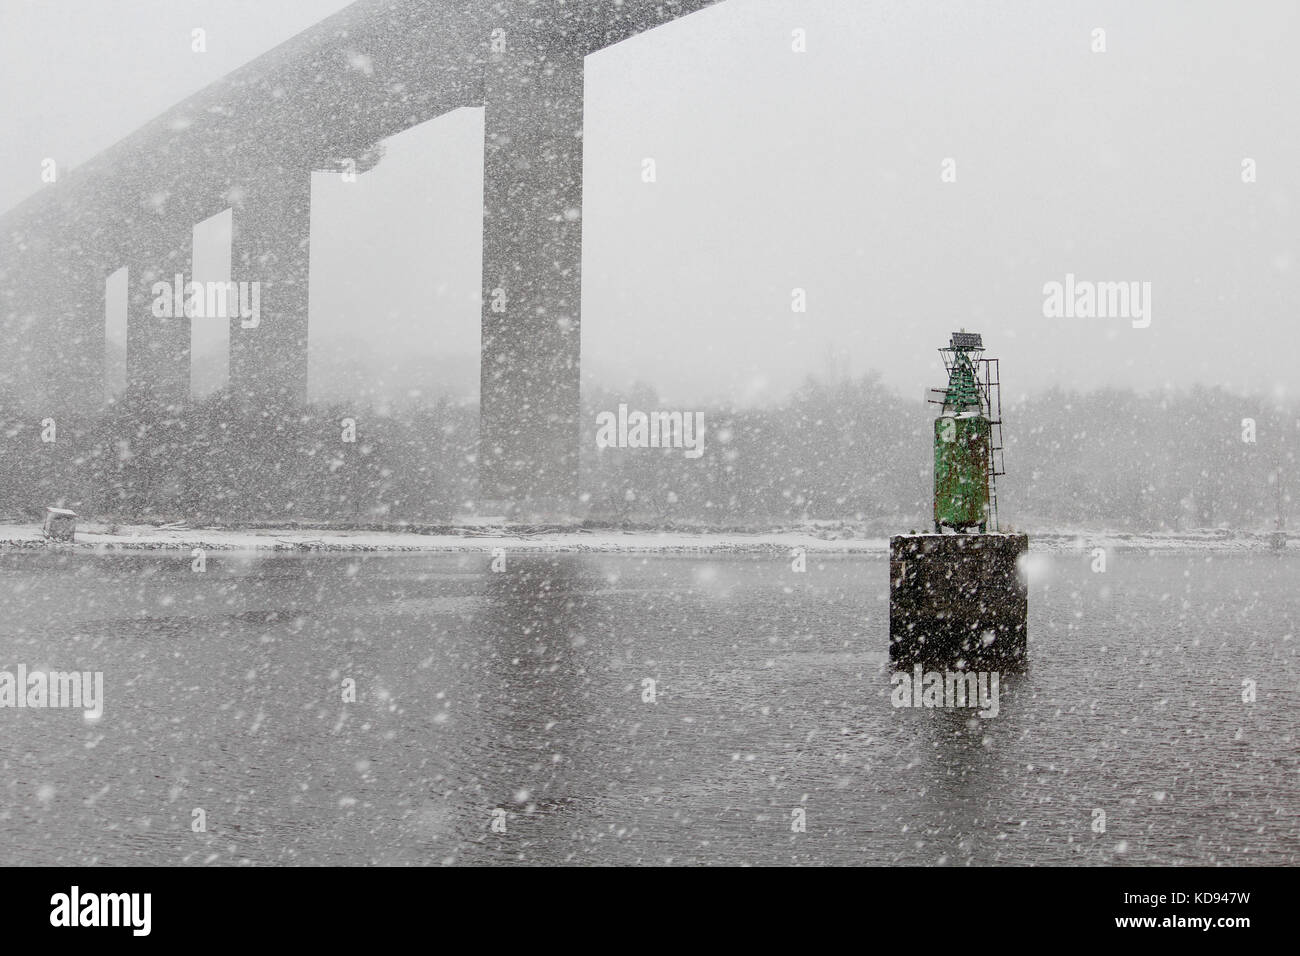 Erskine bridge snow fall - Stock Image